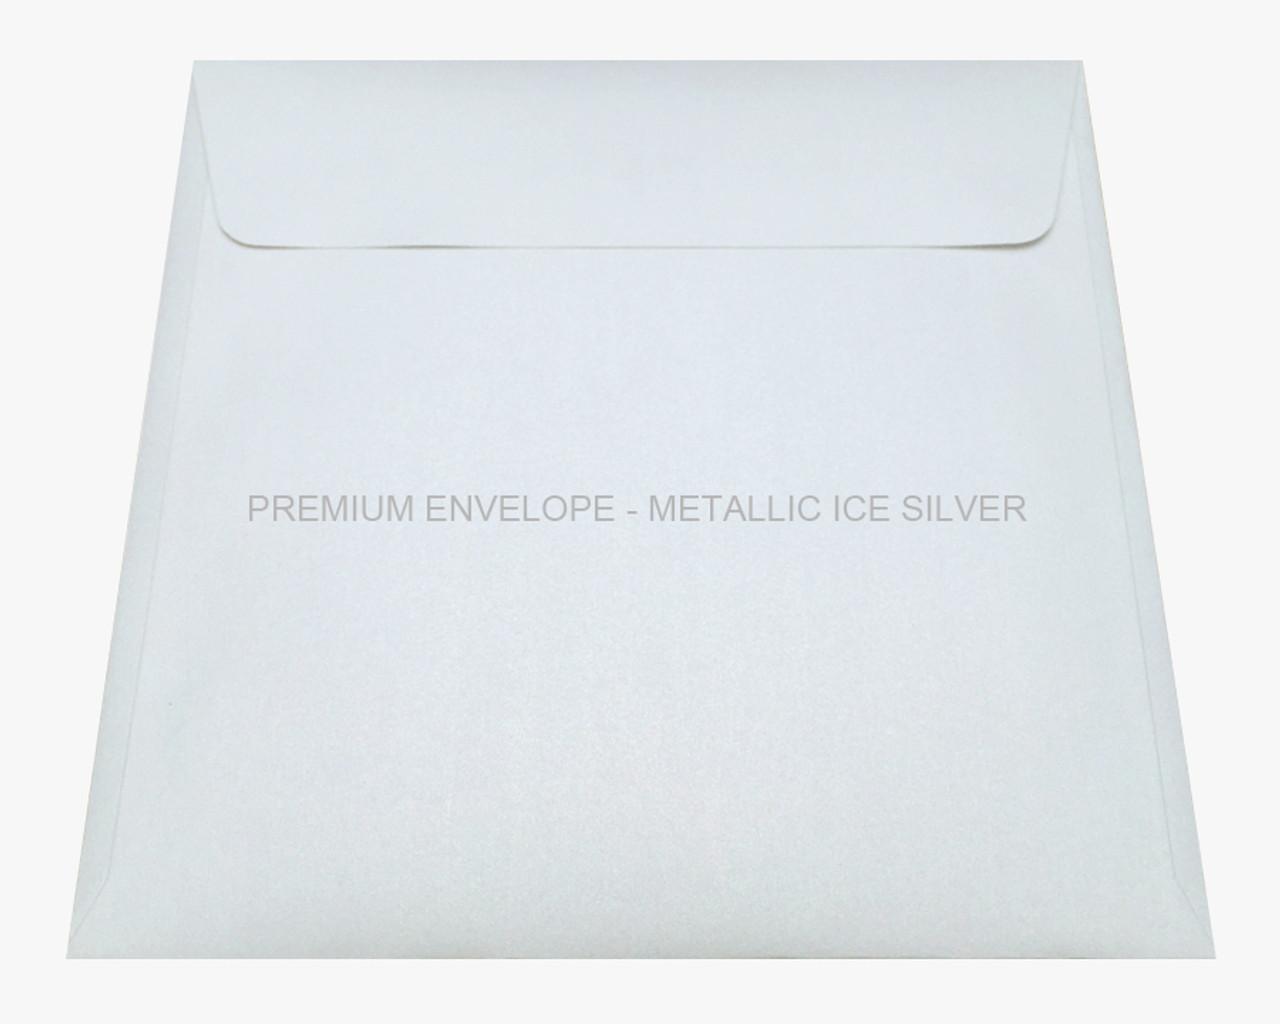 Premium Envelope - Metallic Ice Silver